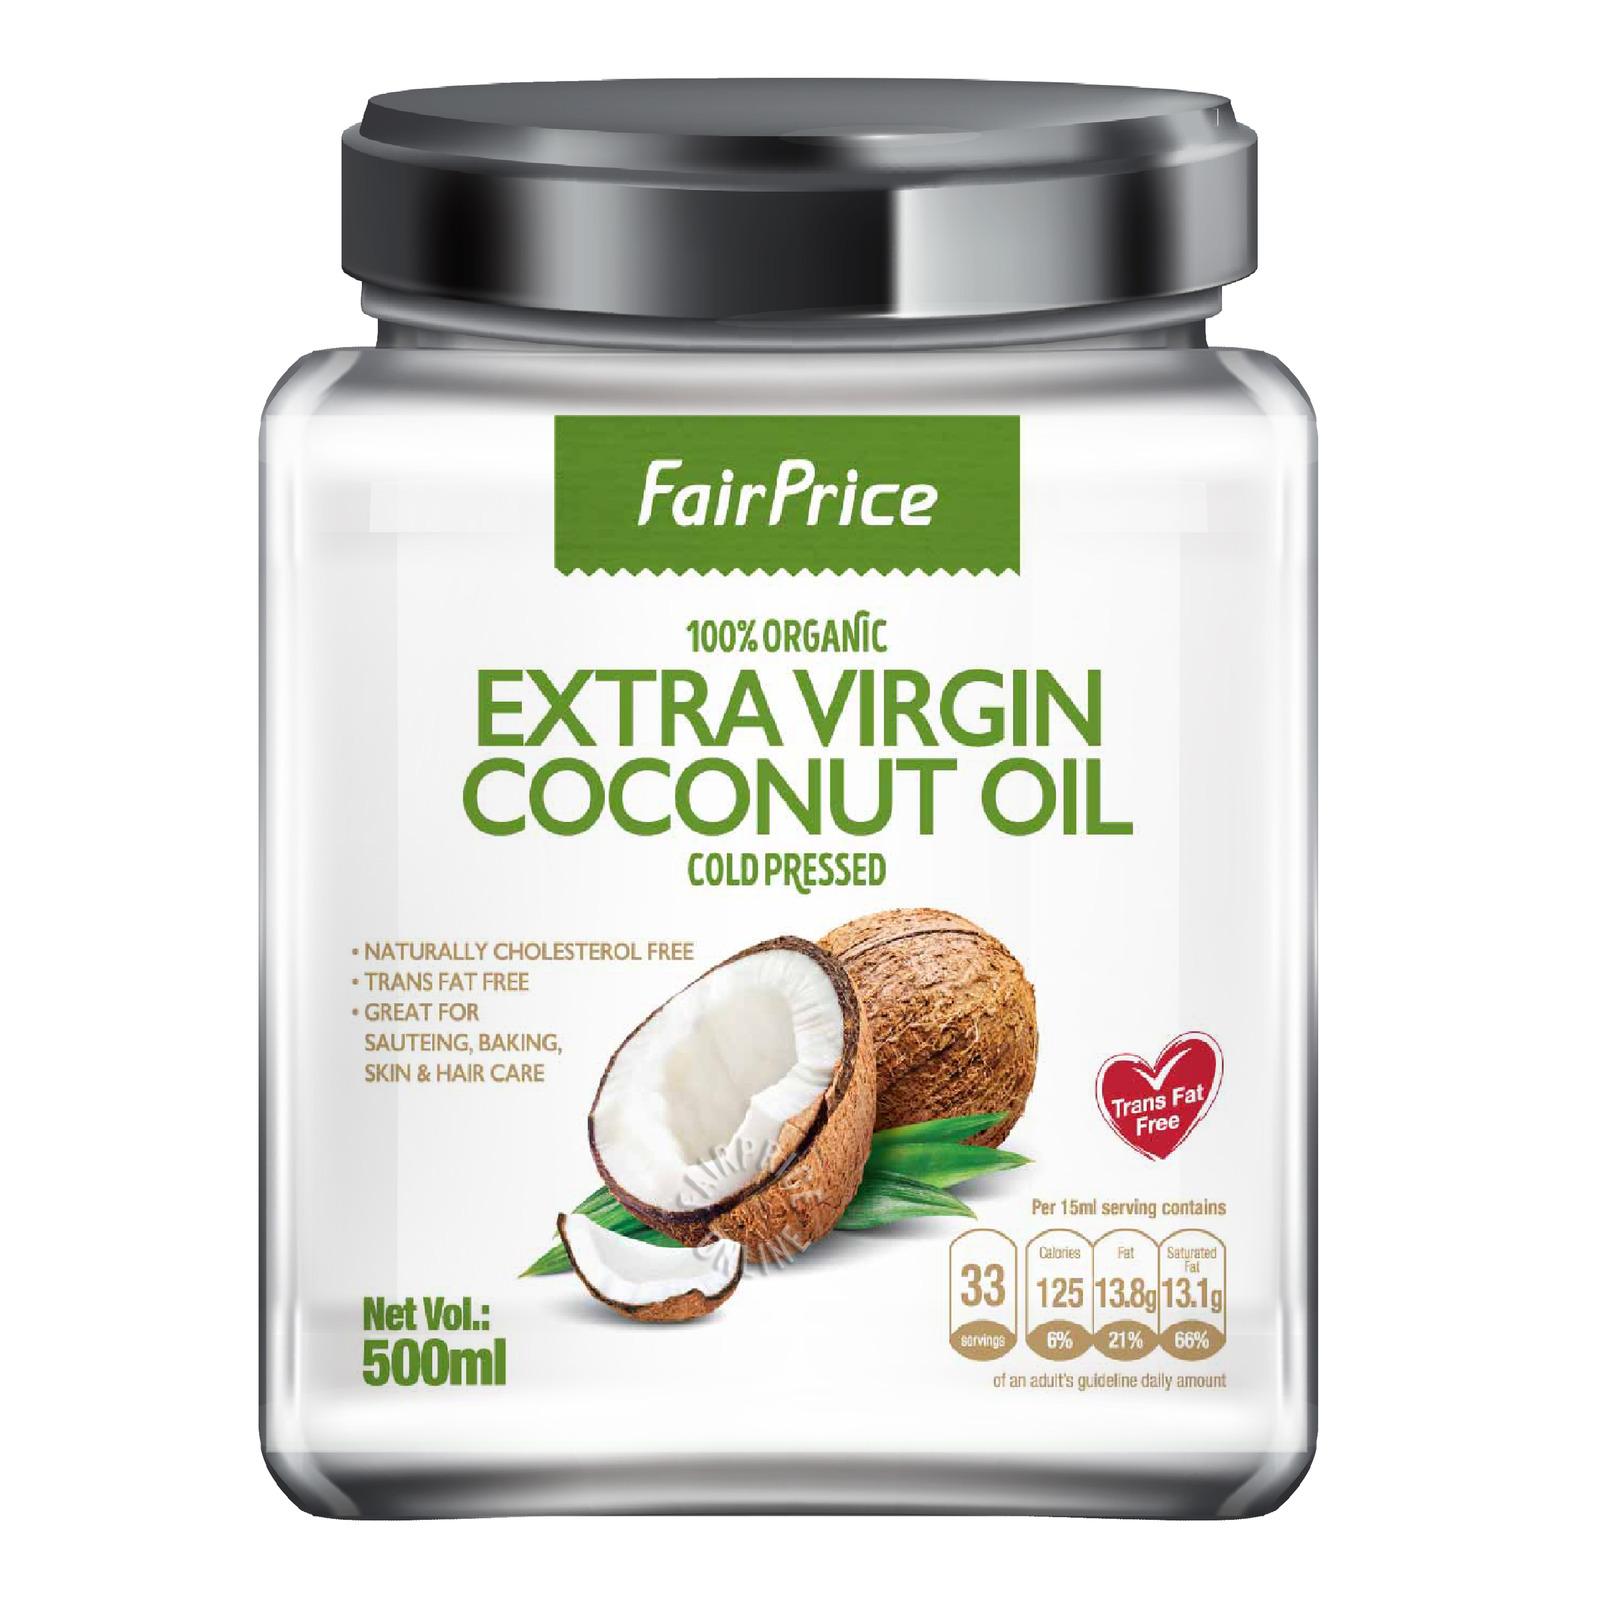 FairPrice Extra Virgin Coconut Oil (Cold Pressed)